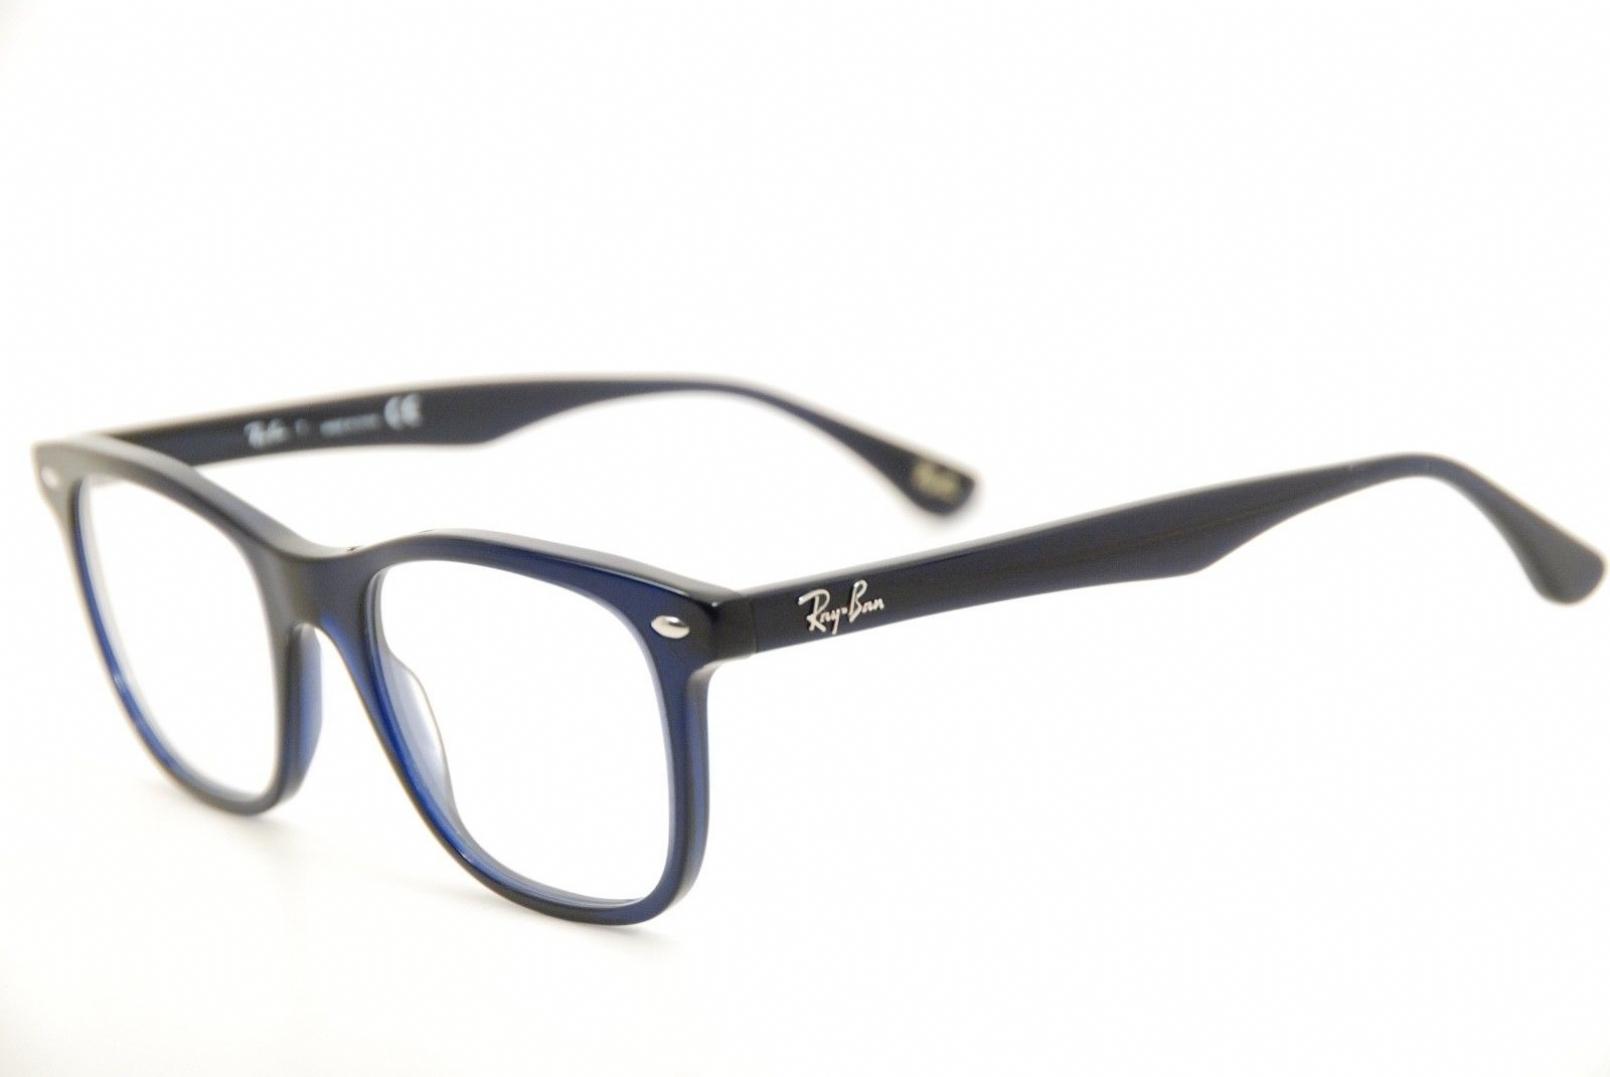 7d71834321 Ray Ban 5248 Eyeglasses